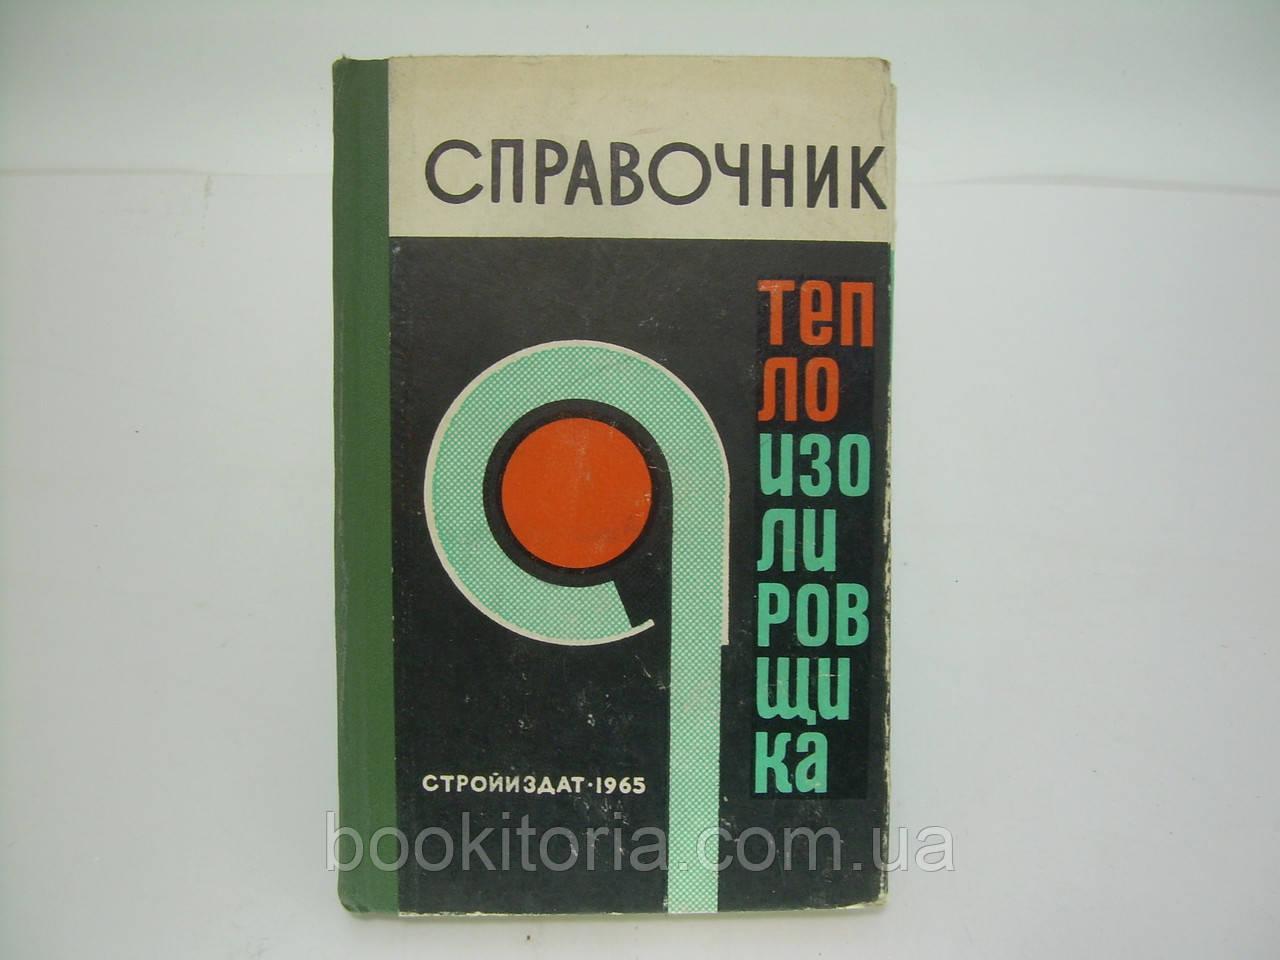 Грушман Р.П. Справочник теплоизолировщика (б/у).